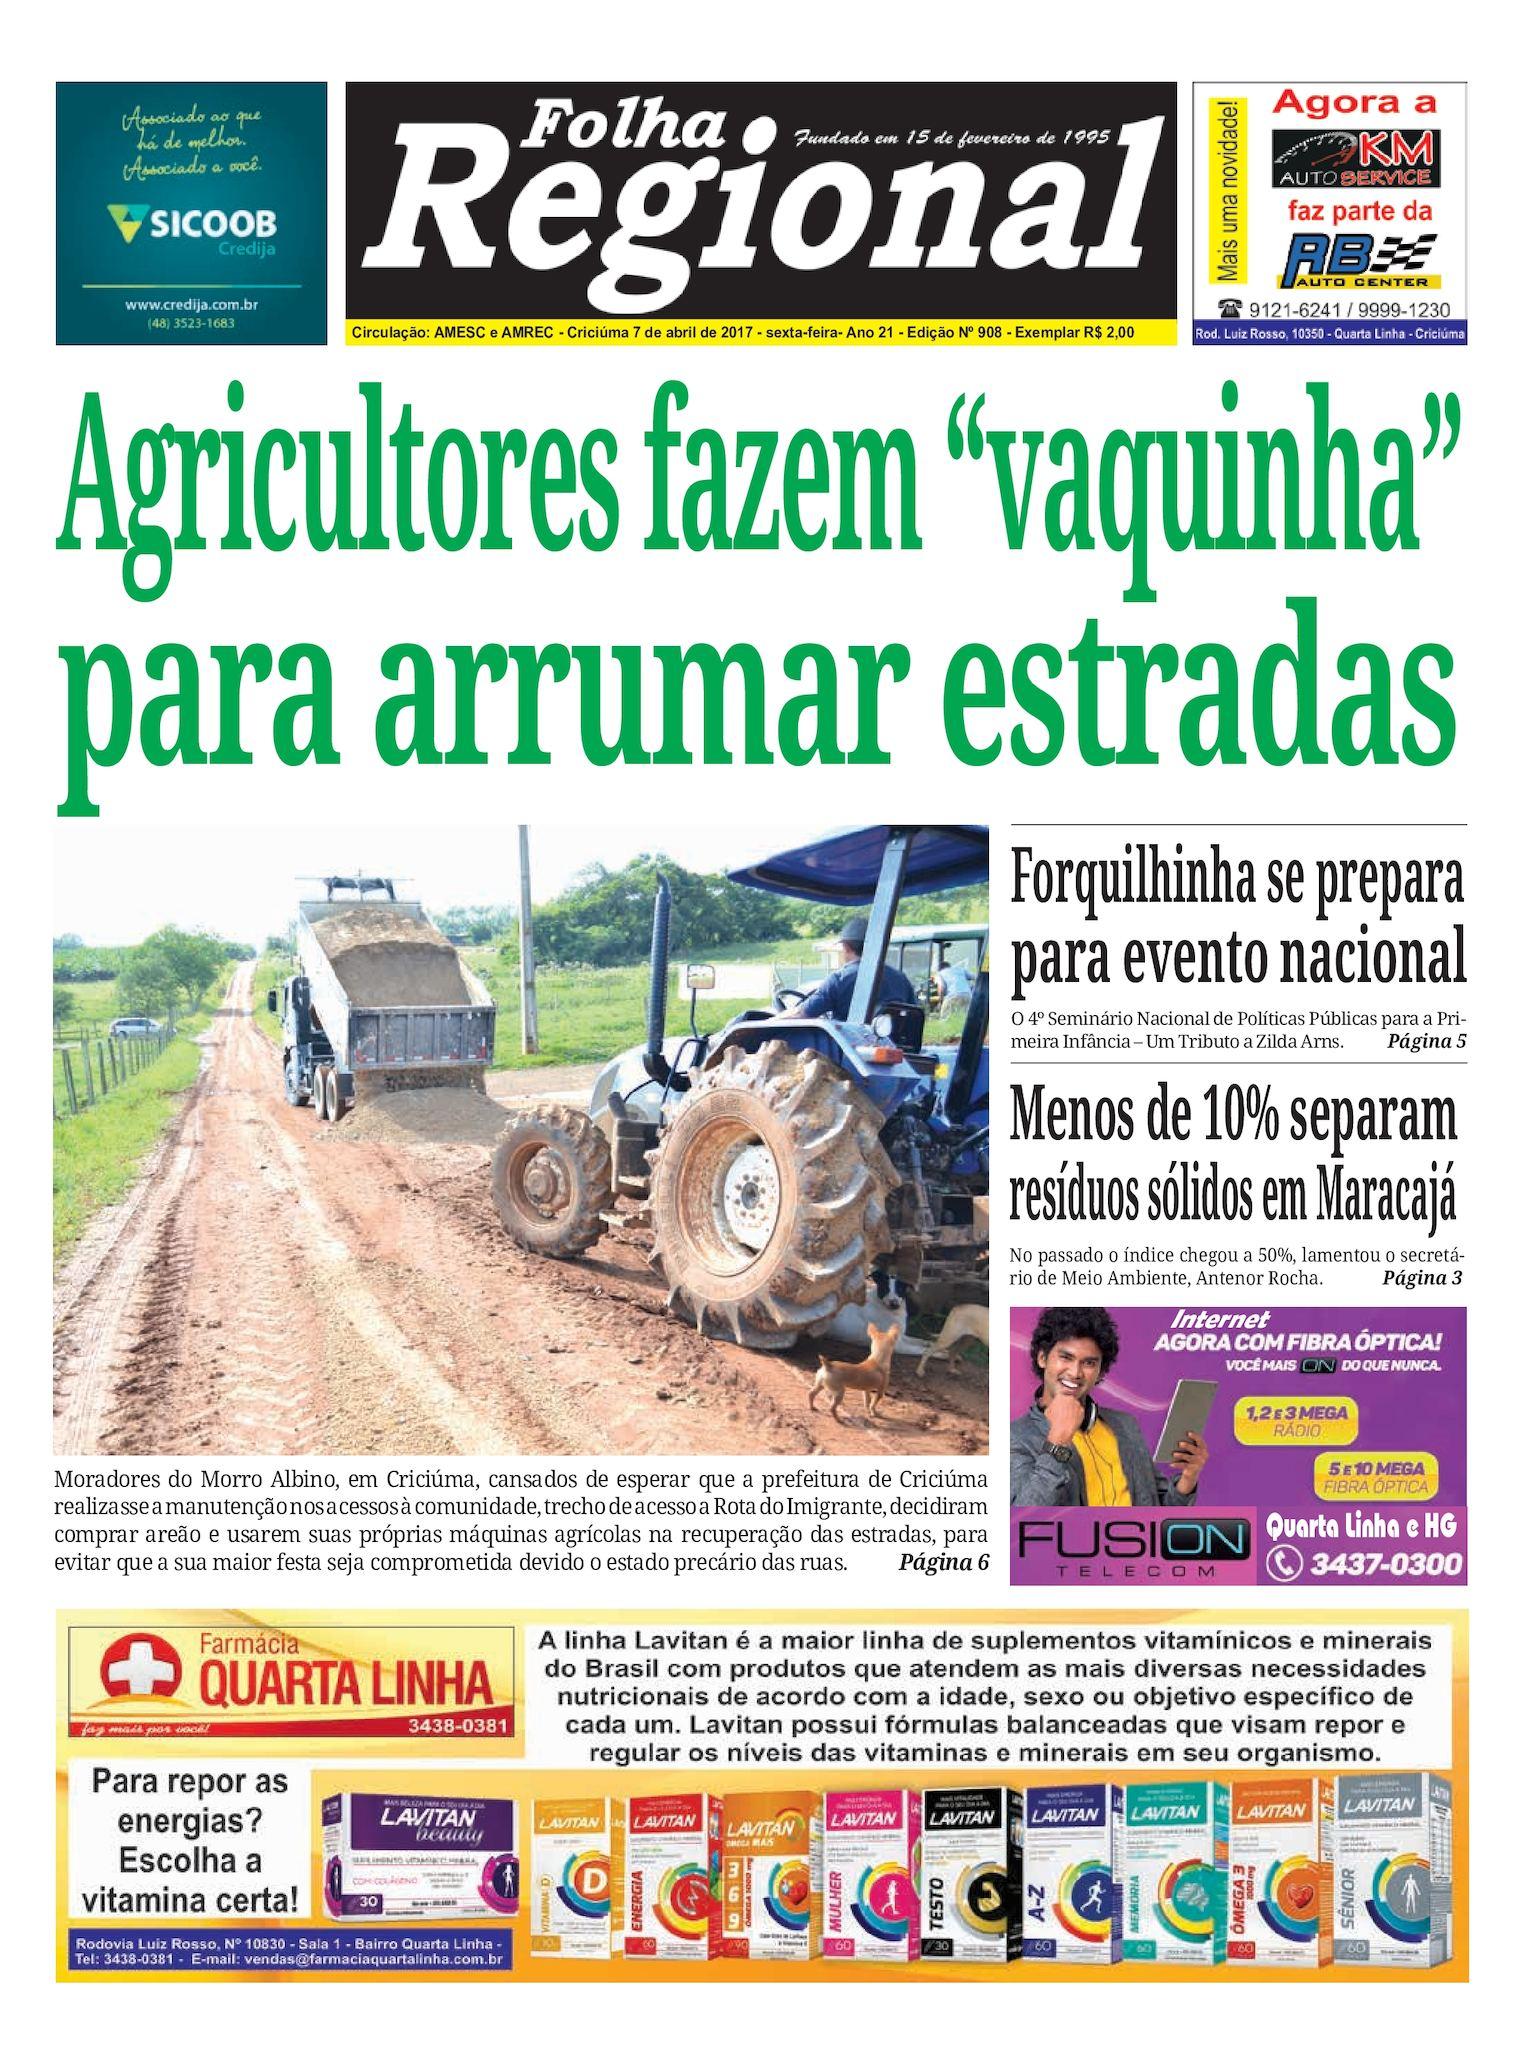 Calaméo - Folha Regional Ed.908 - 07 04 2017 707afae285